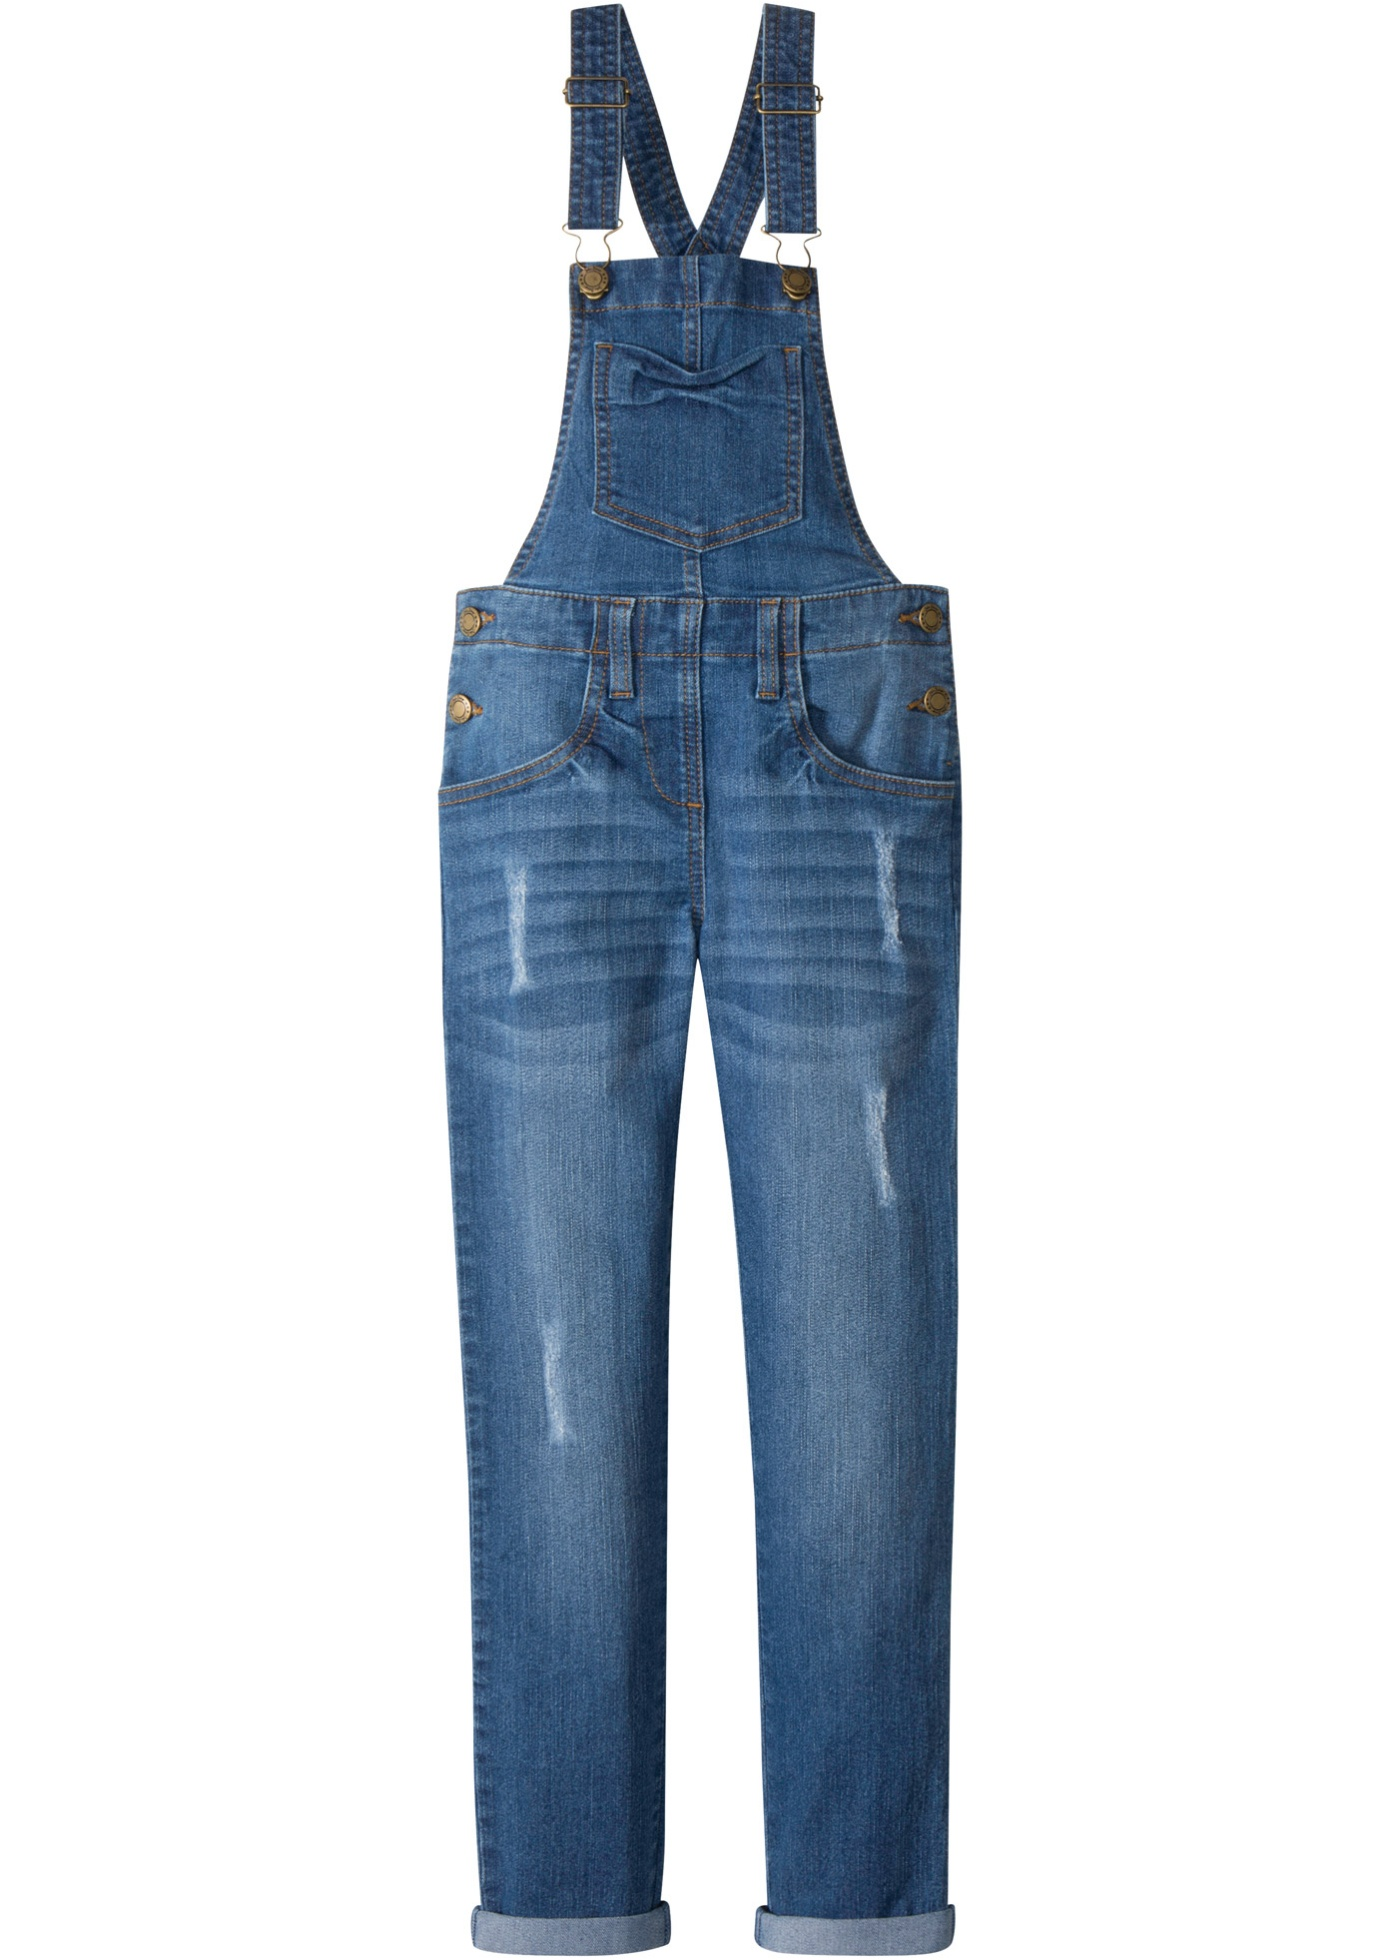 jeans BonPrix